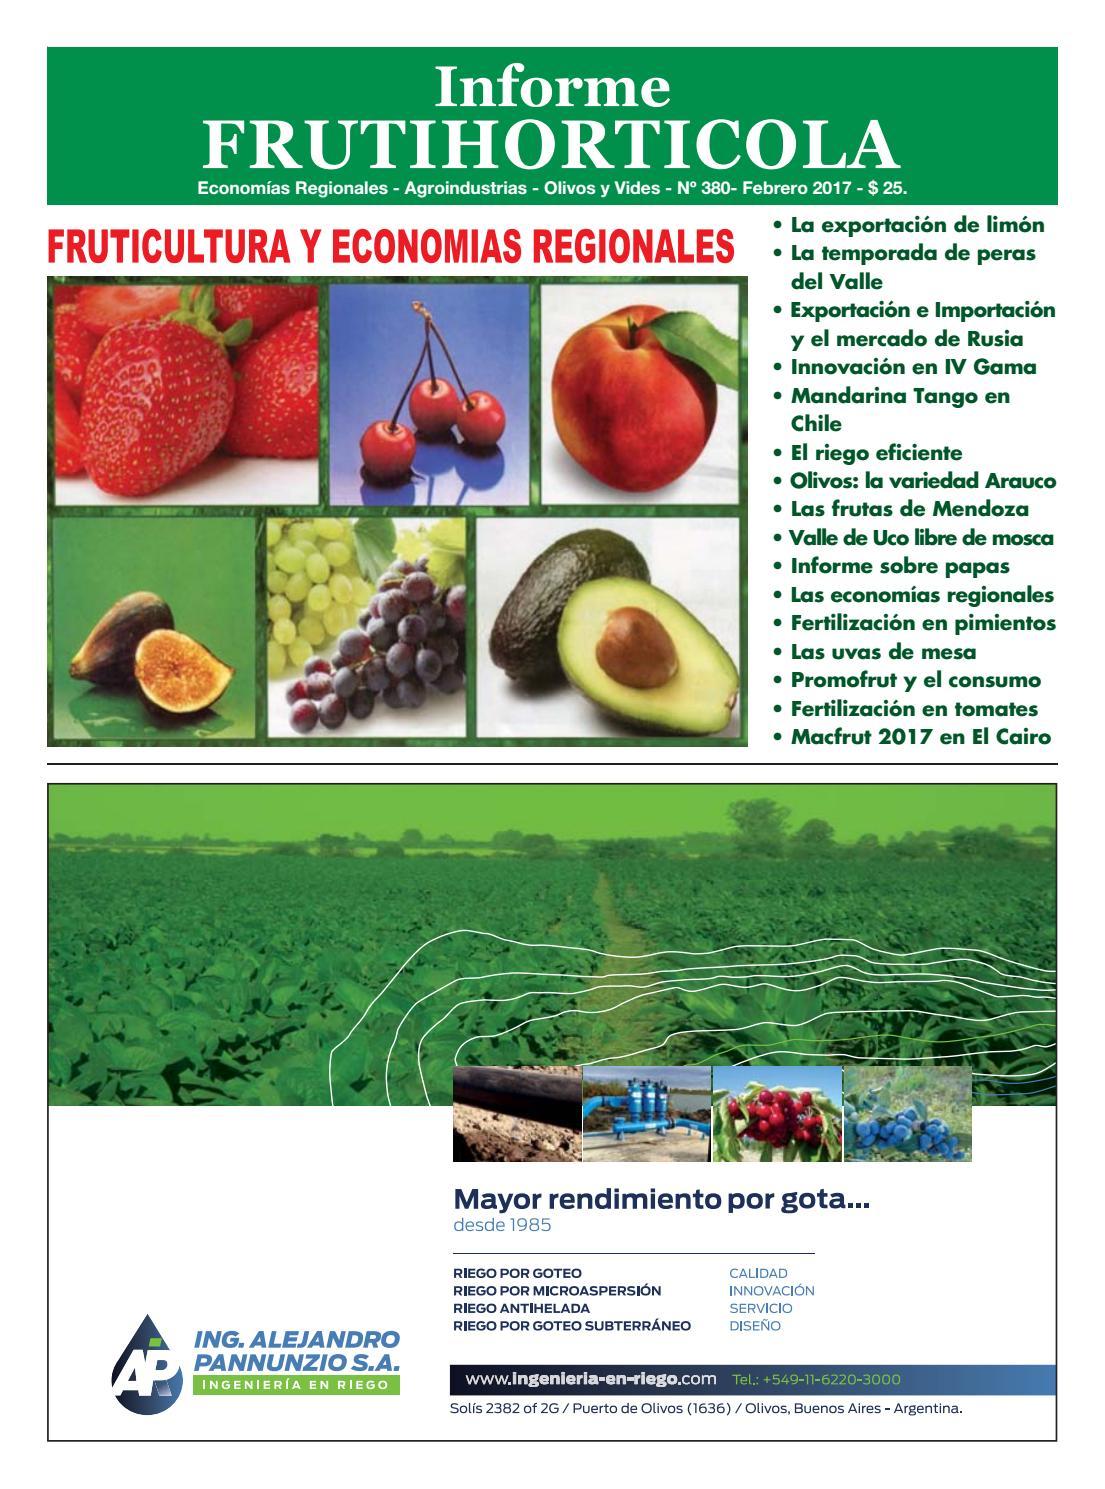 Informe Frutihorticola Febrero 2017 by Horticultura & Poscosecha - issuu